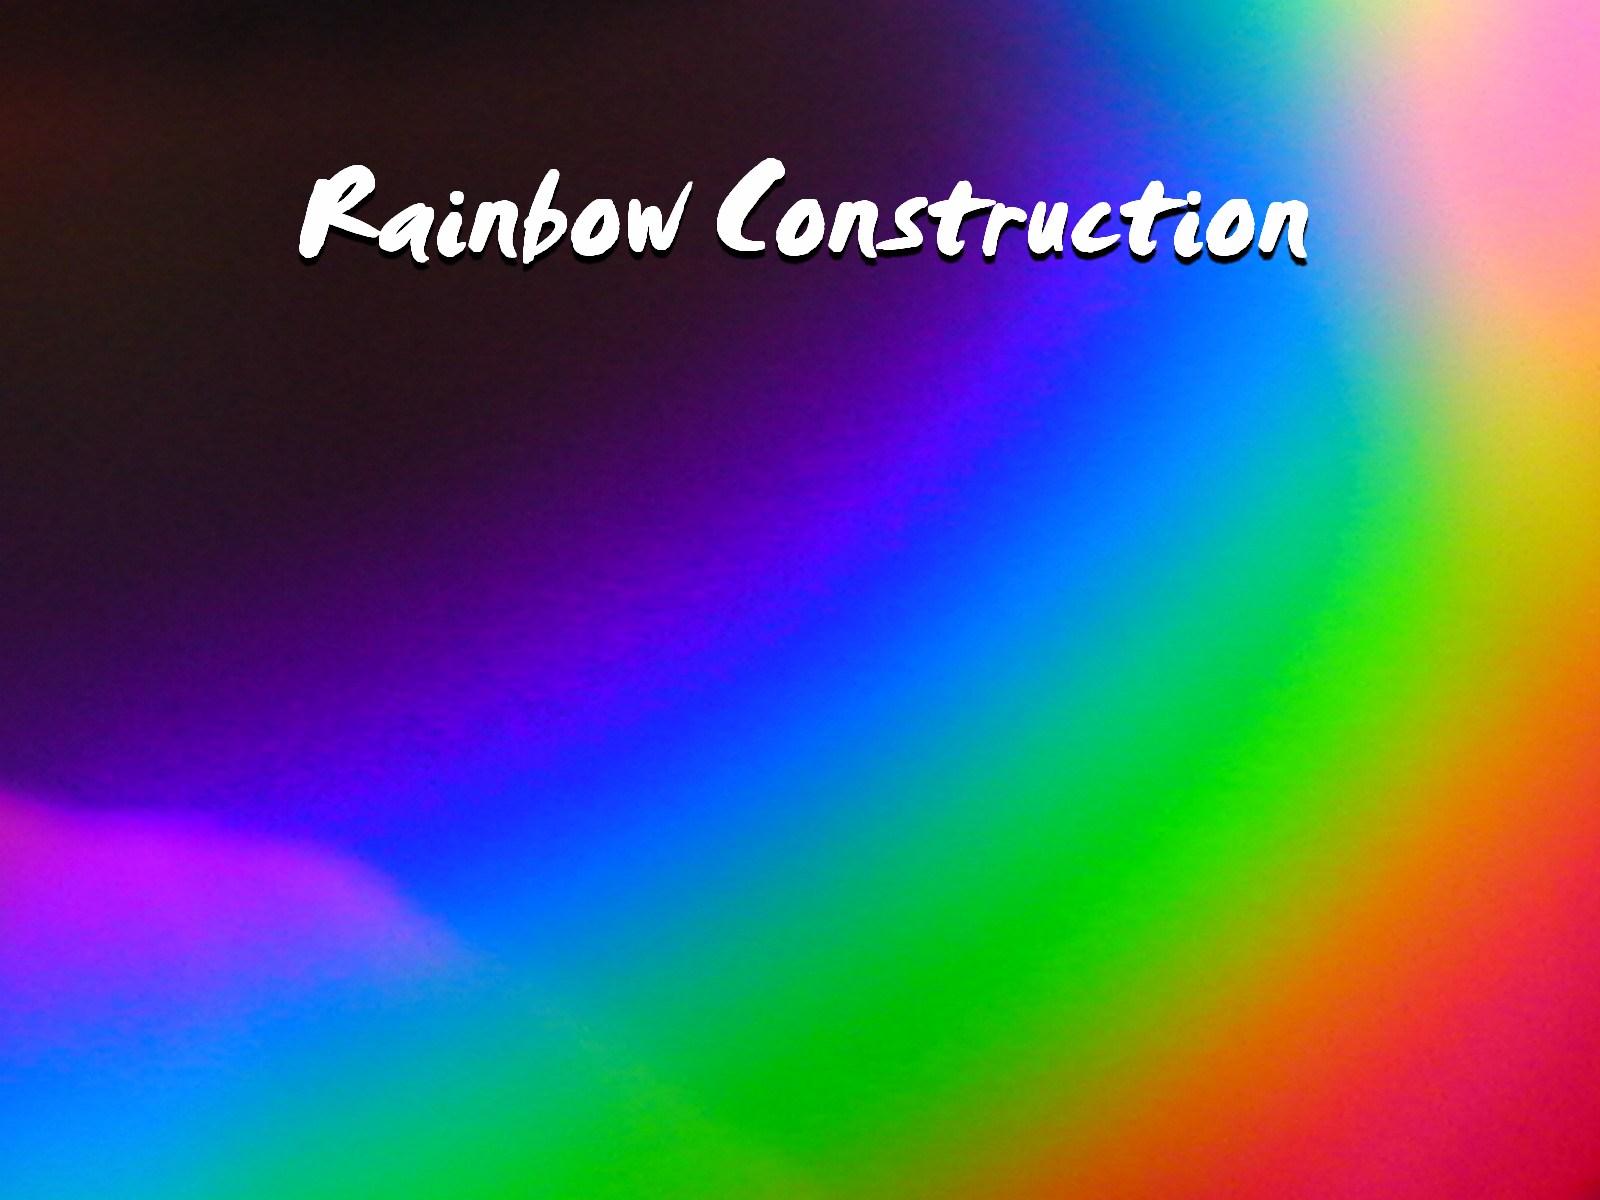 Rainbow Construction